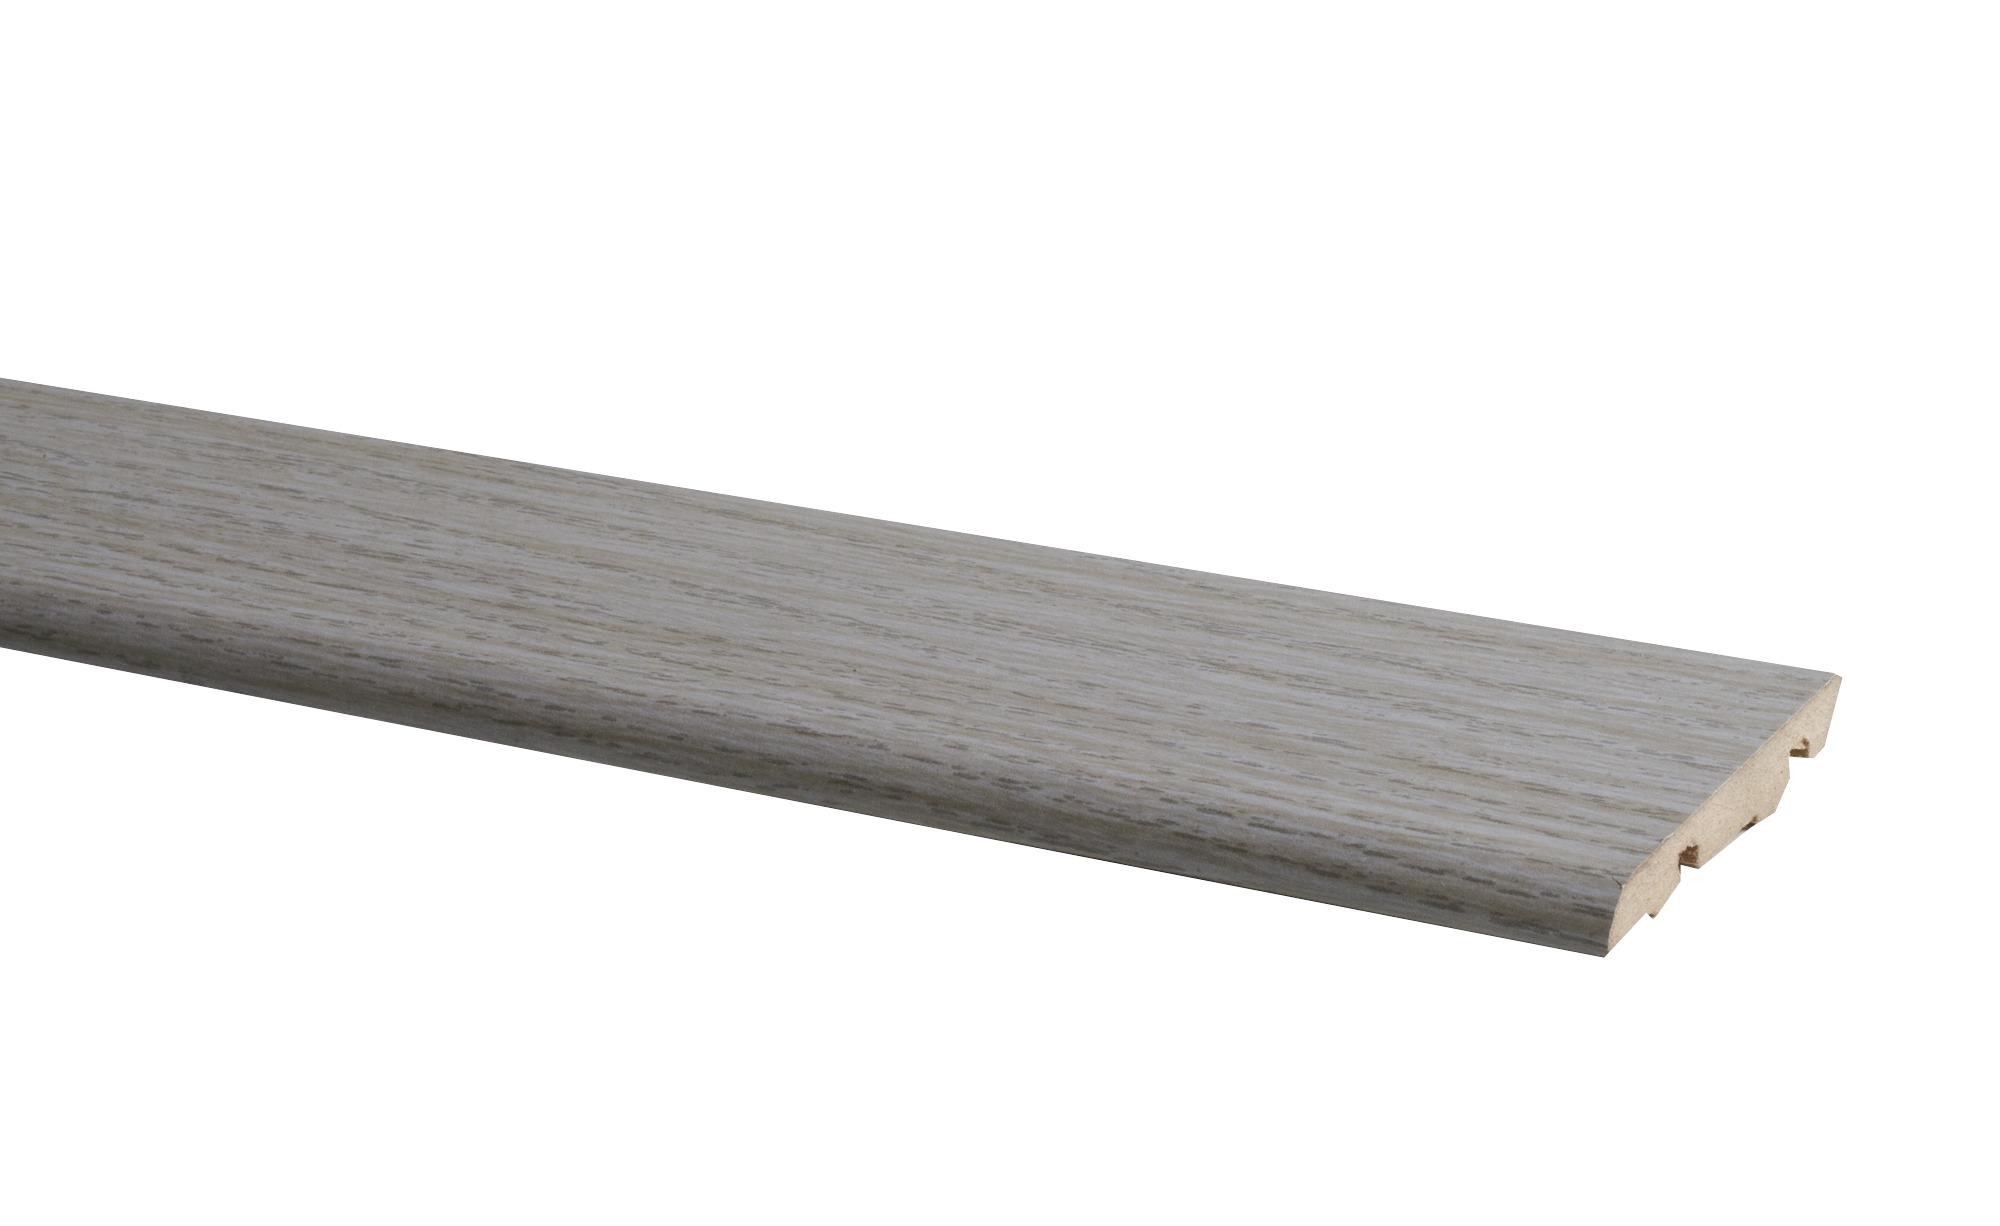 Muurplint grijs eiken nr 416 240cm